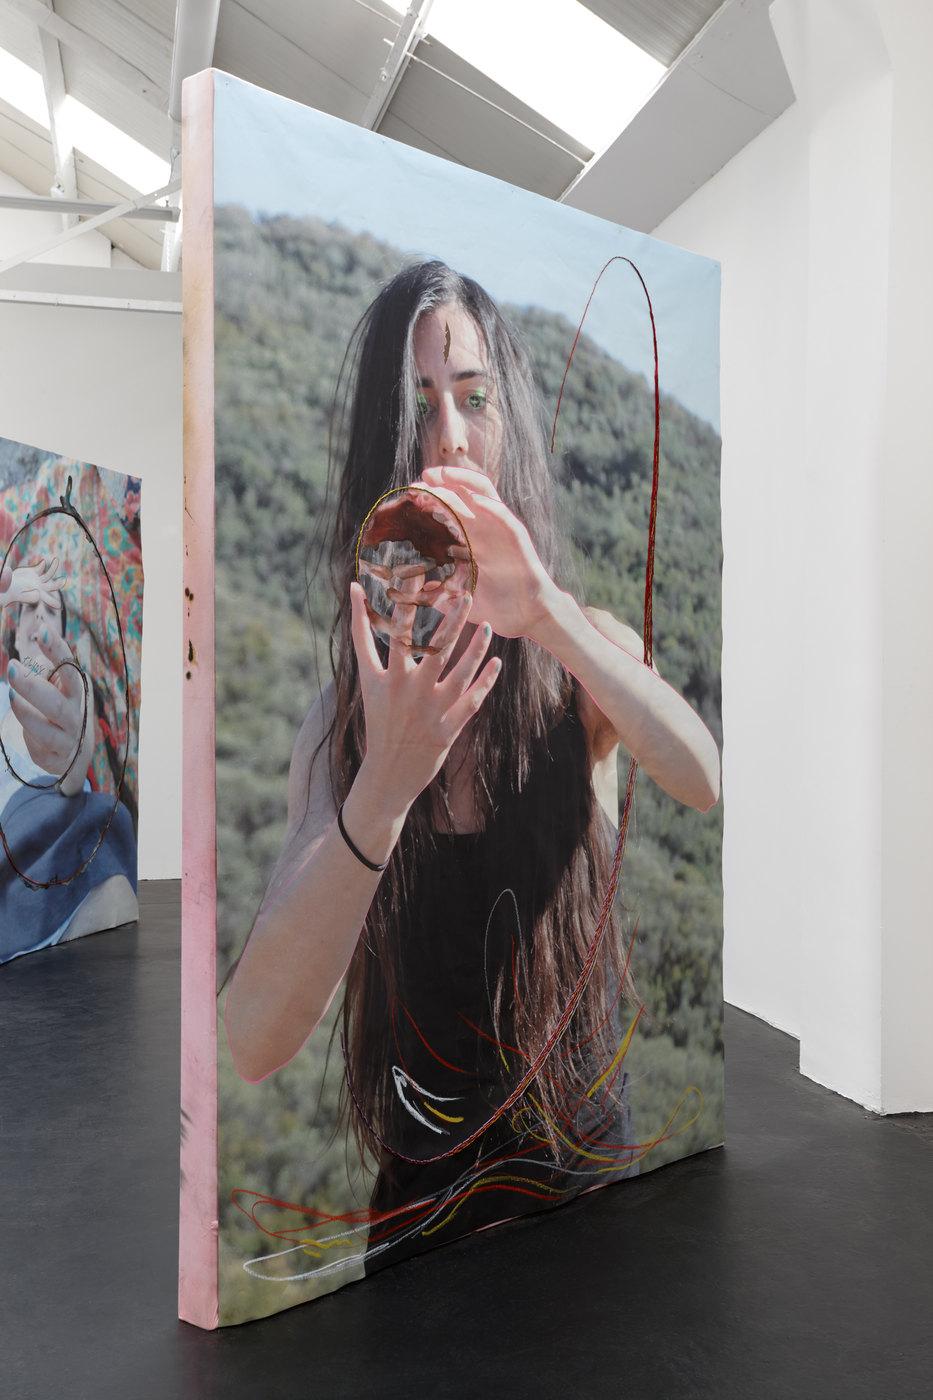 02. Nora Berman - X girl (Nora orb), 2016 (ii)